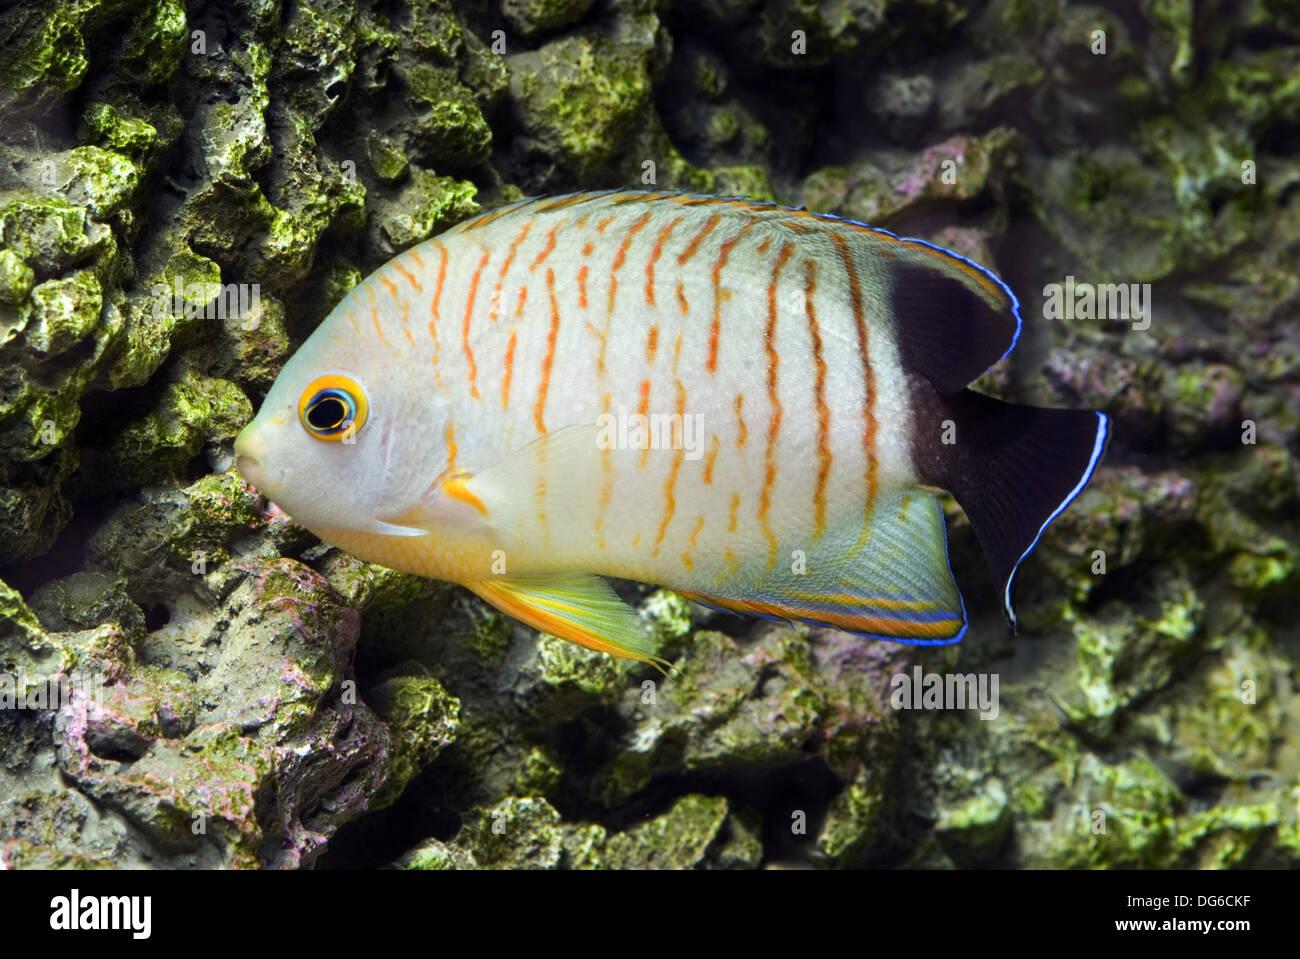 blacktail angelfish, centropyge eibli - Stock Image